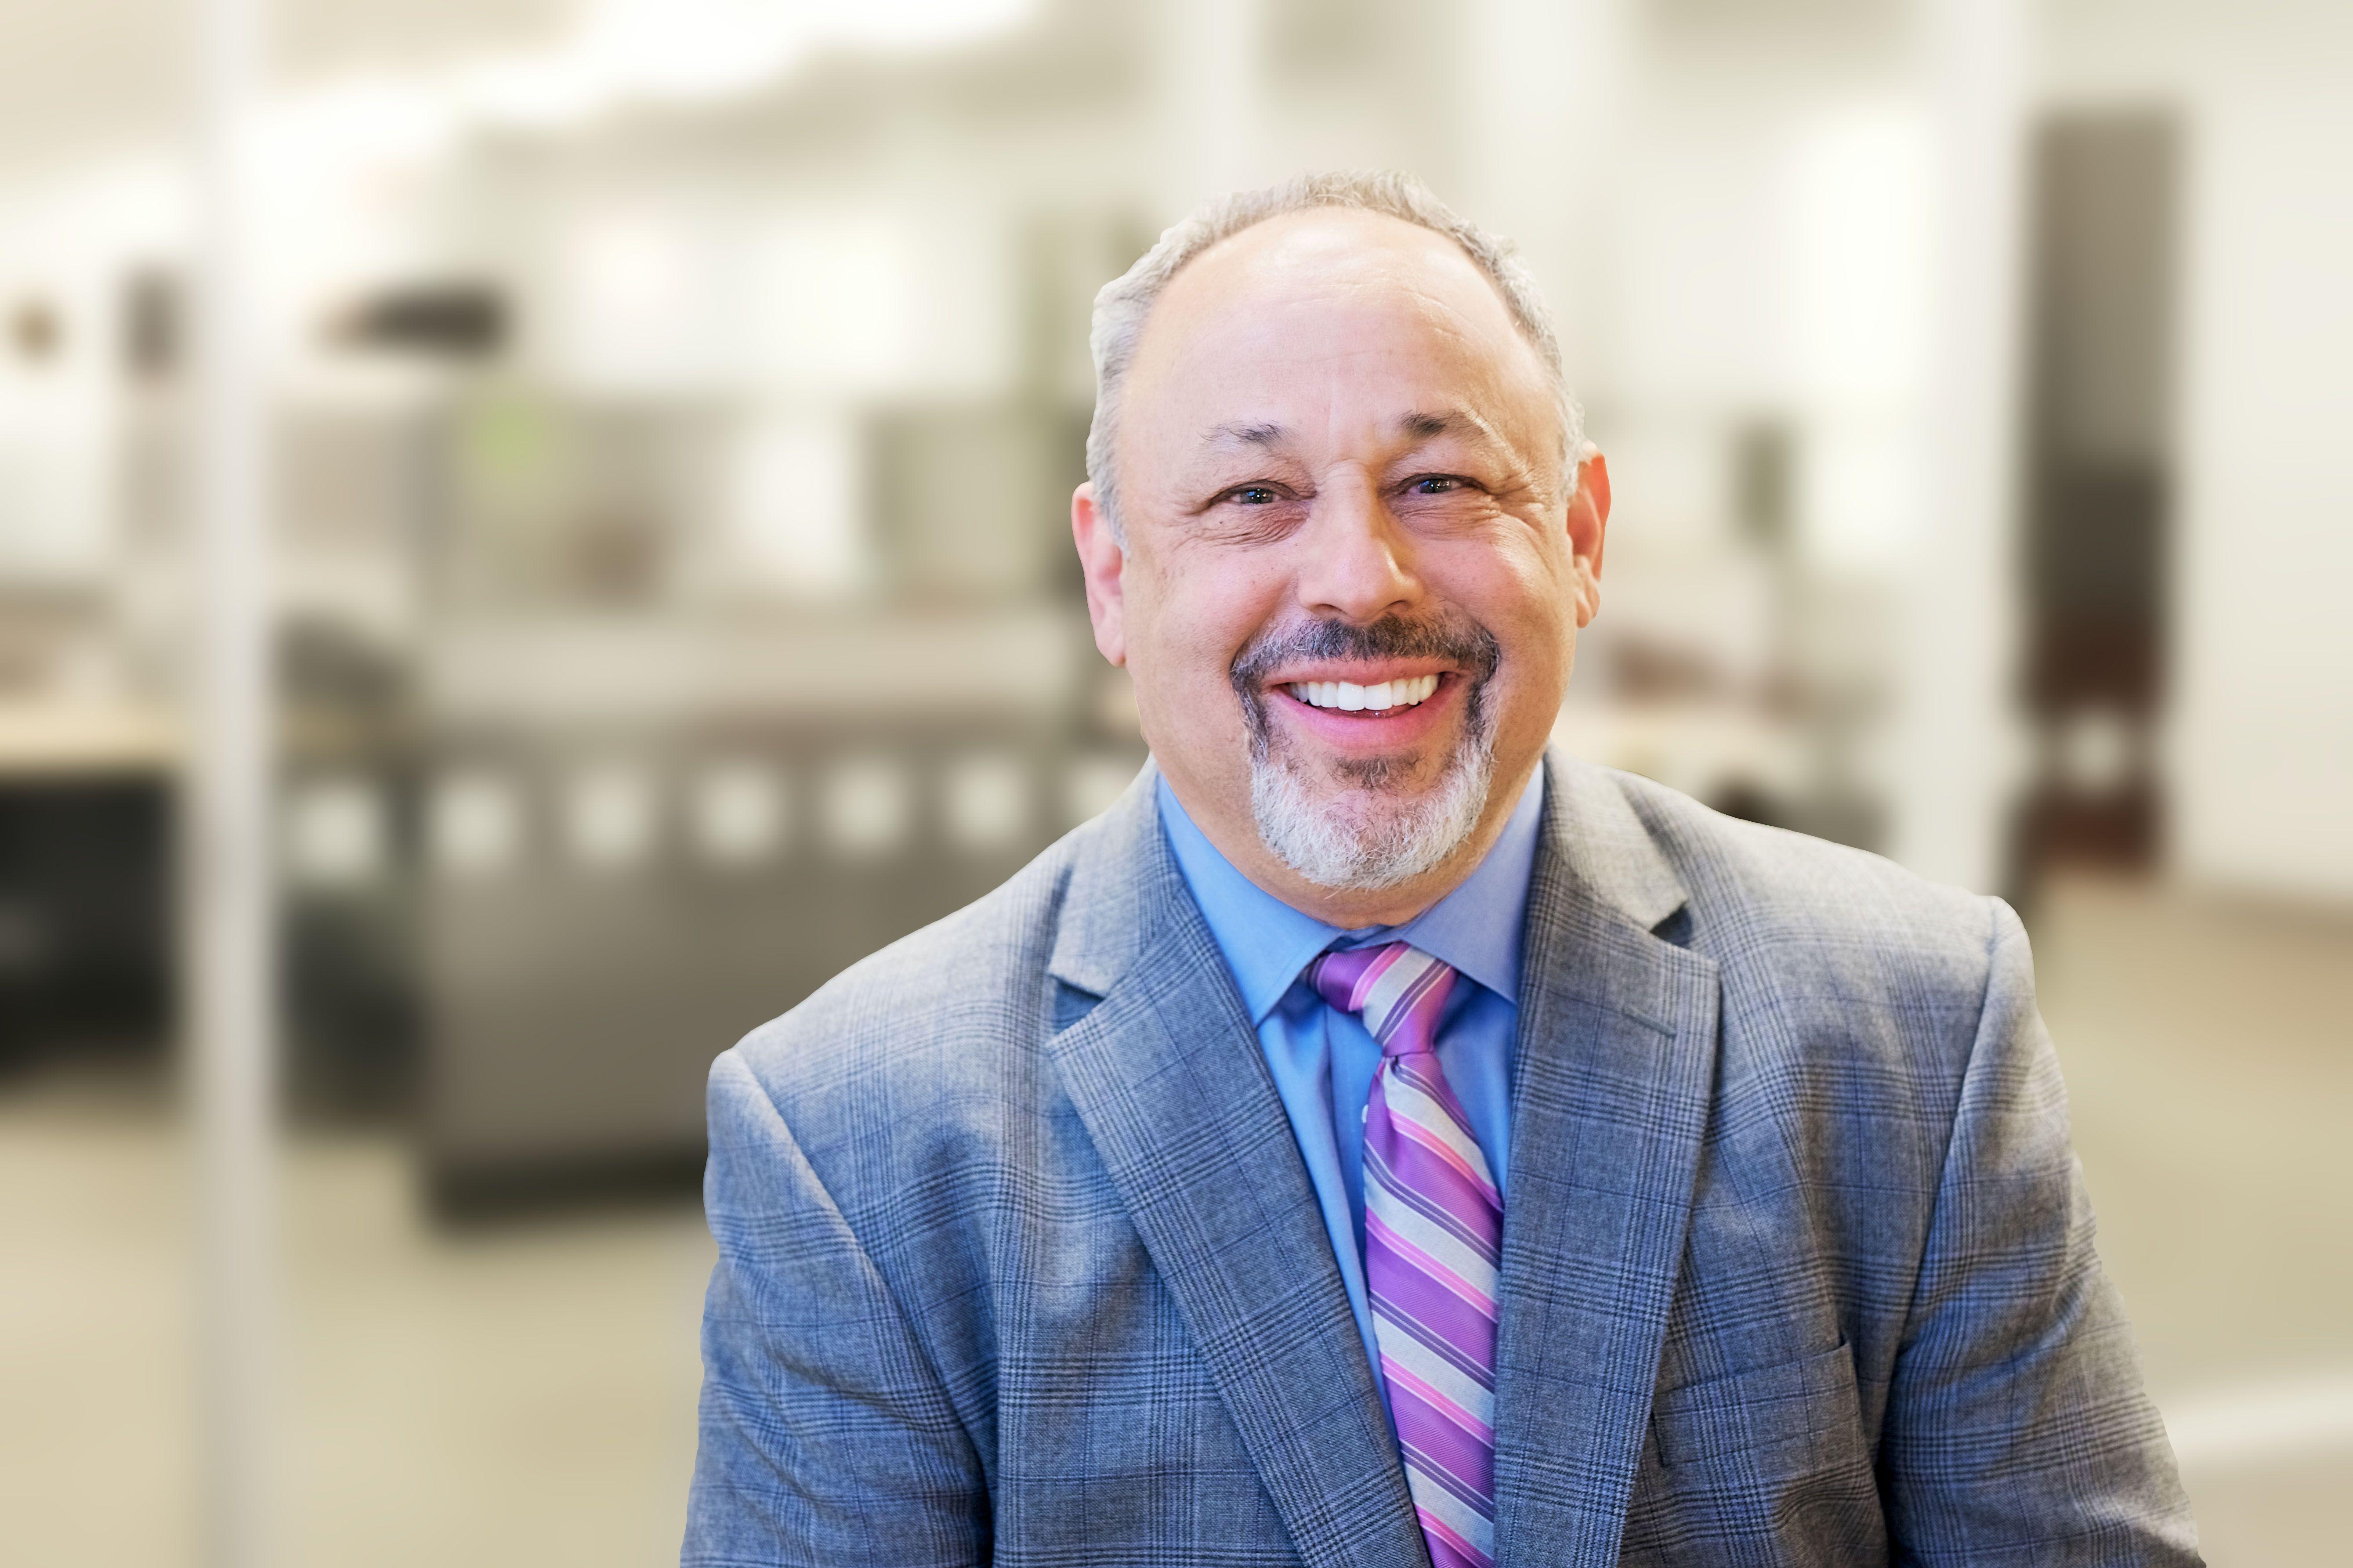 Ed Walovitch, Senior Vice President of Sales at itelligence North America